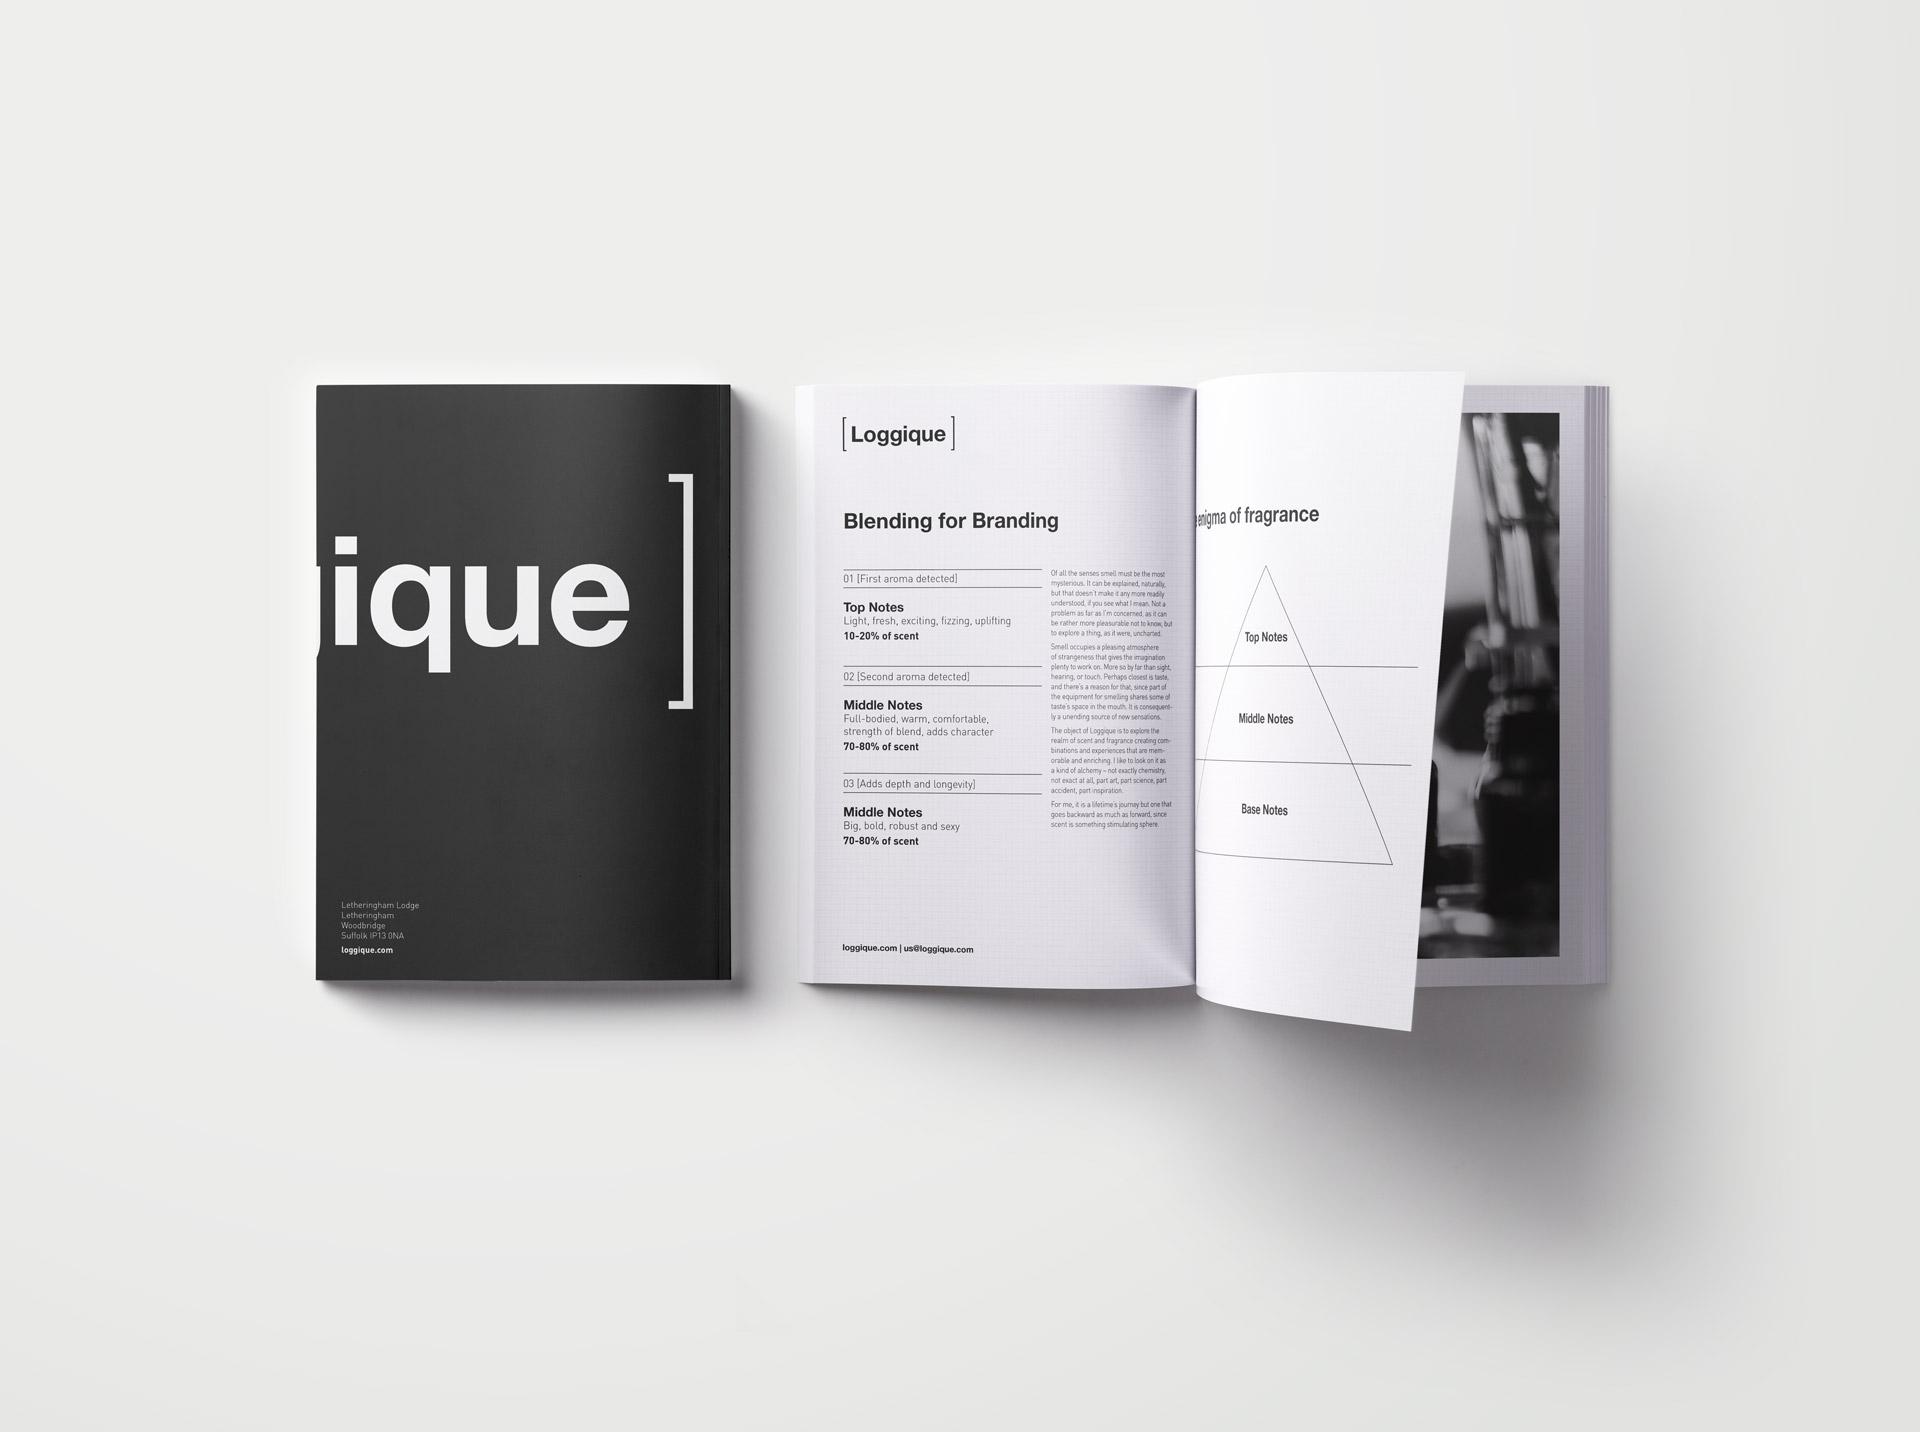 Magazine-Mockup-Presentation-vol9loggique.jpg